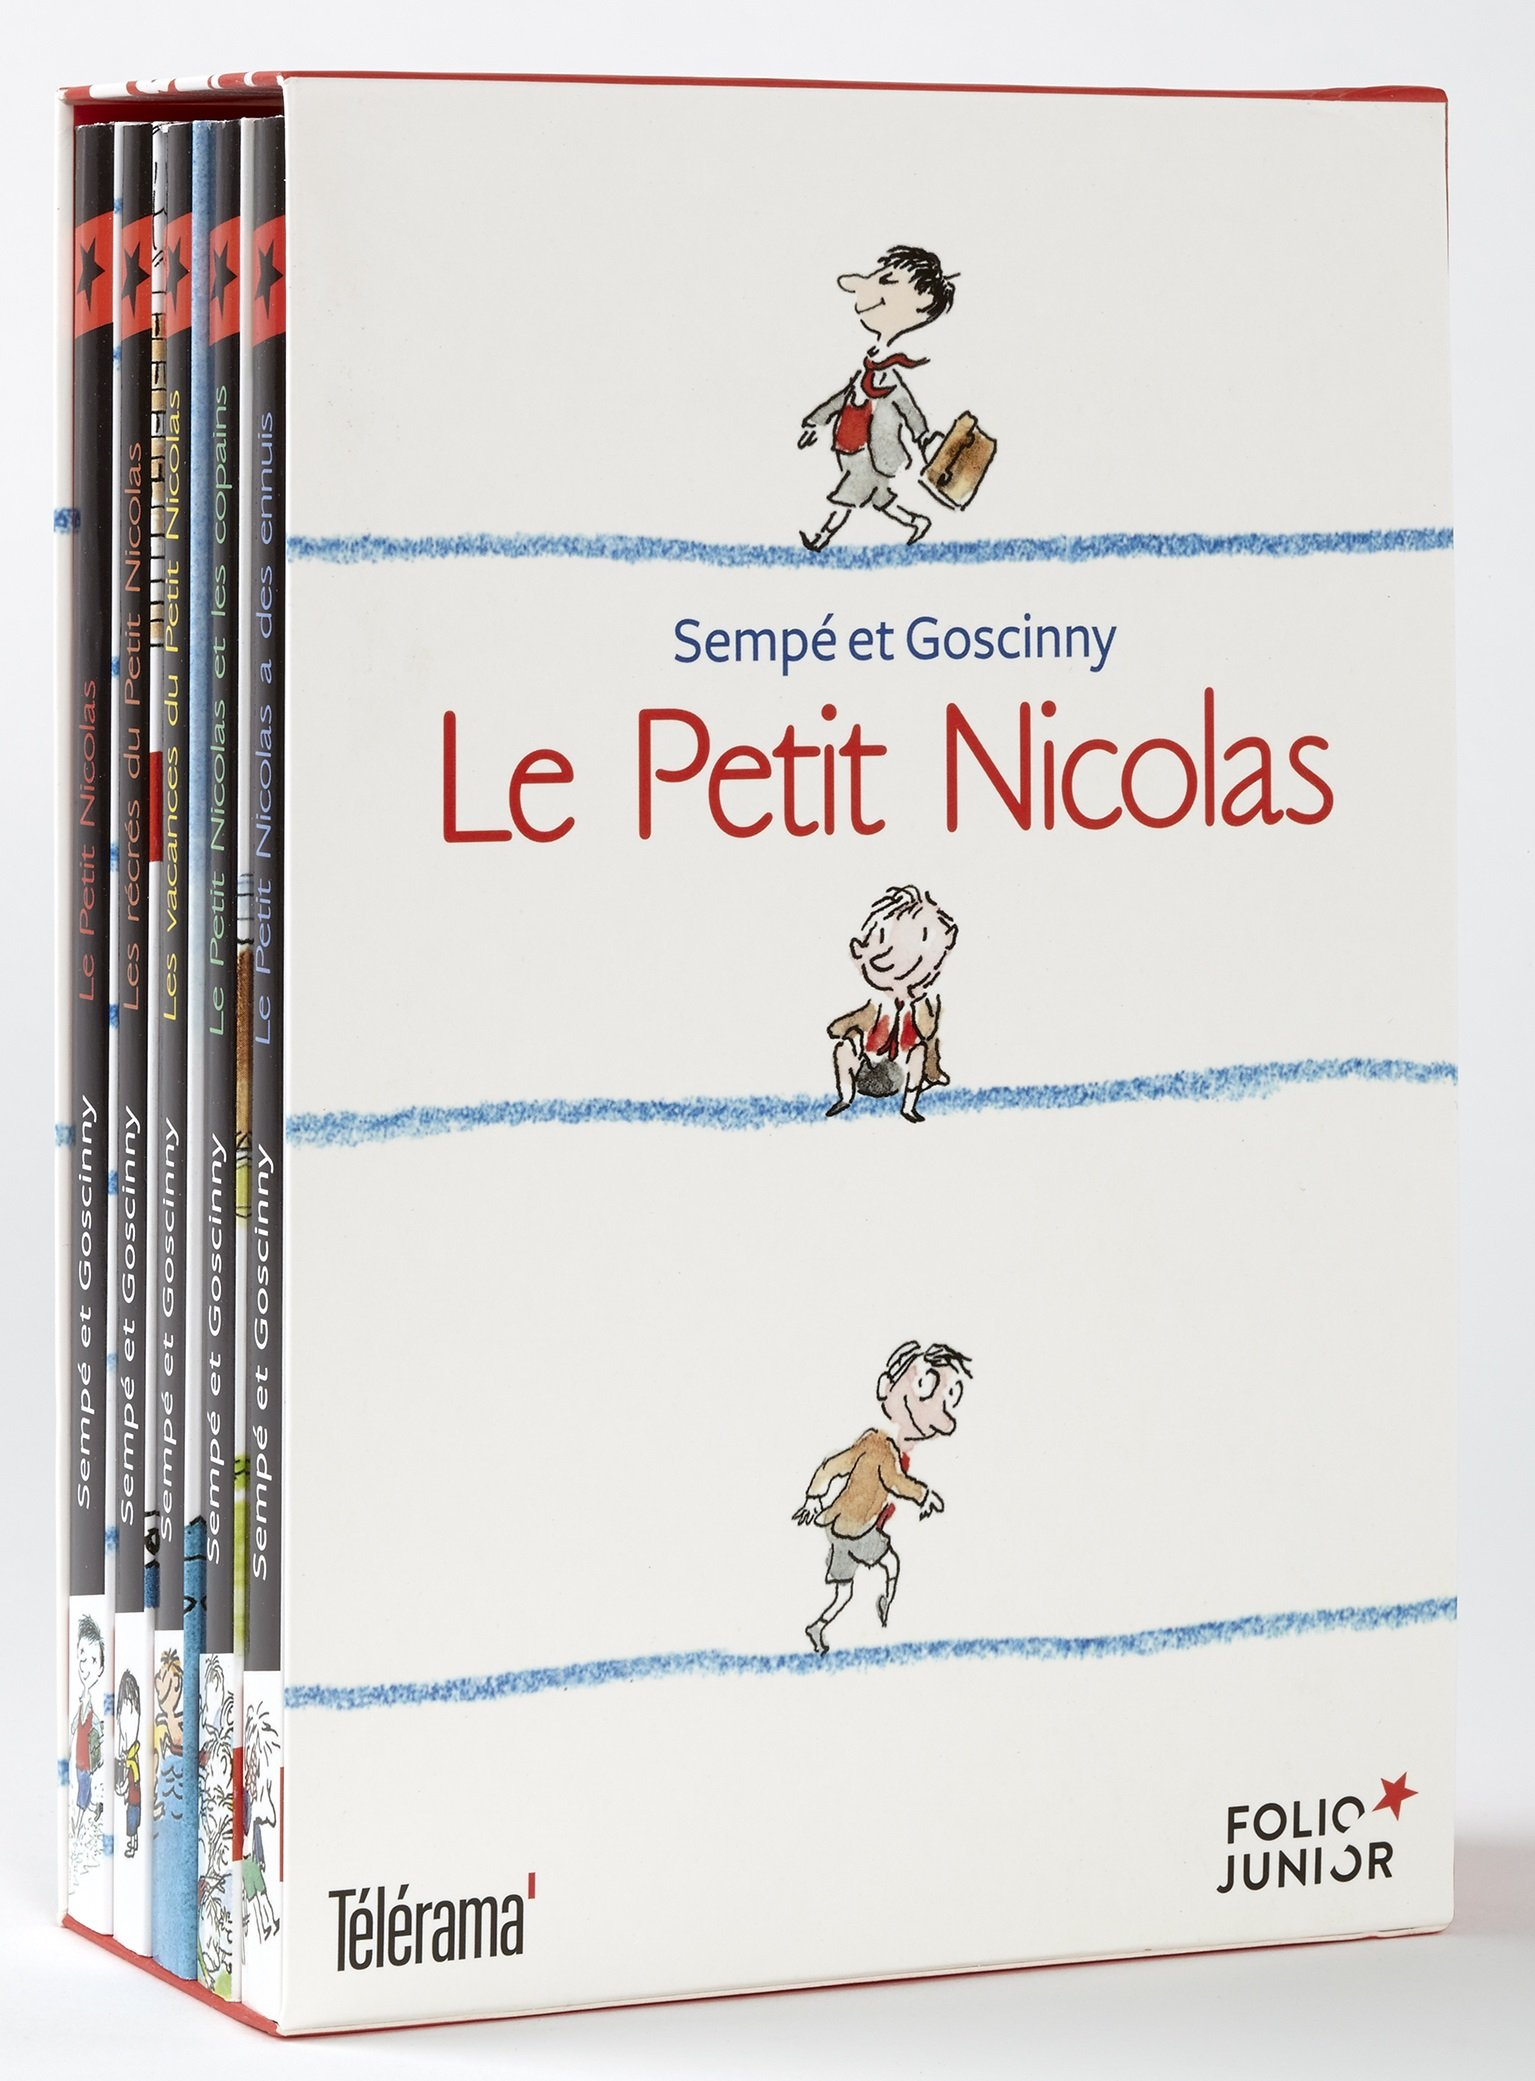 Amazon.fr - Le Petit Nicolas - Sempé, Goscinny, René, Sempé - Livres